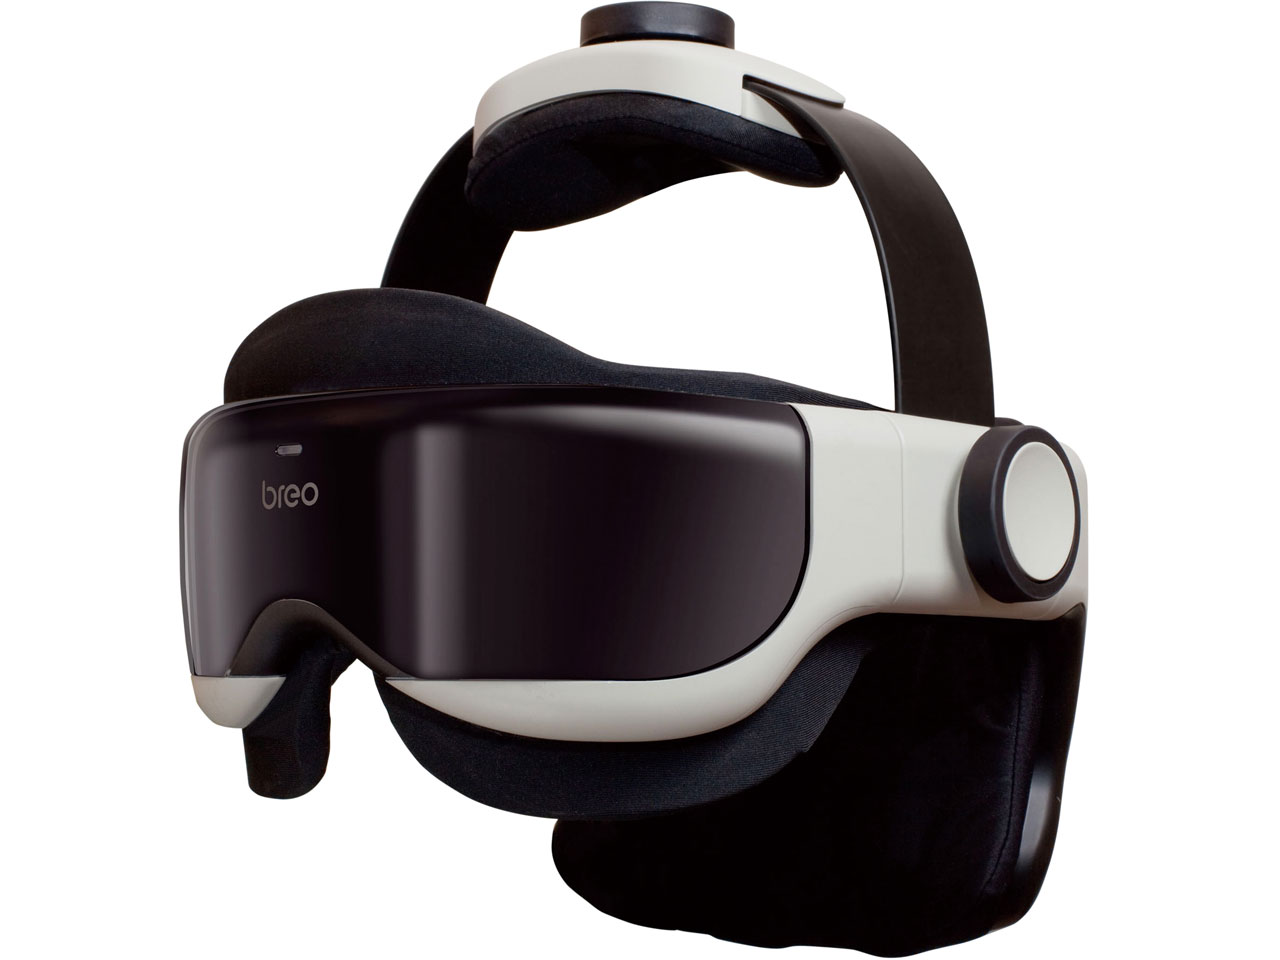 breo mondiale head spa Plus iD1260 の製品画像